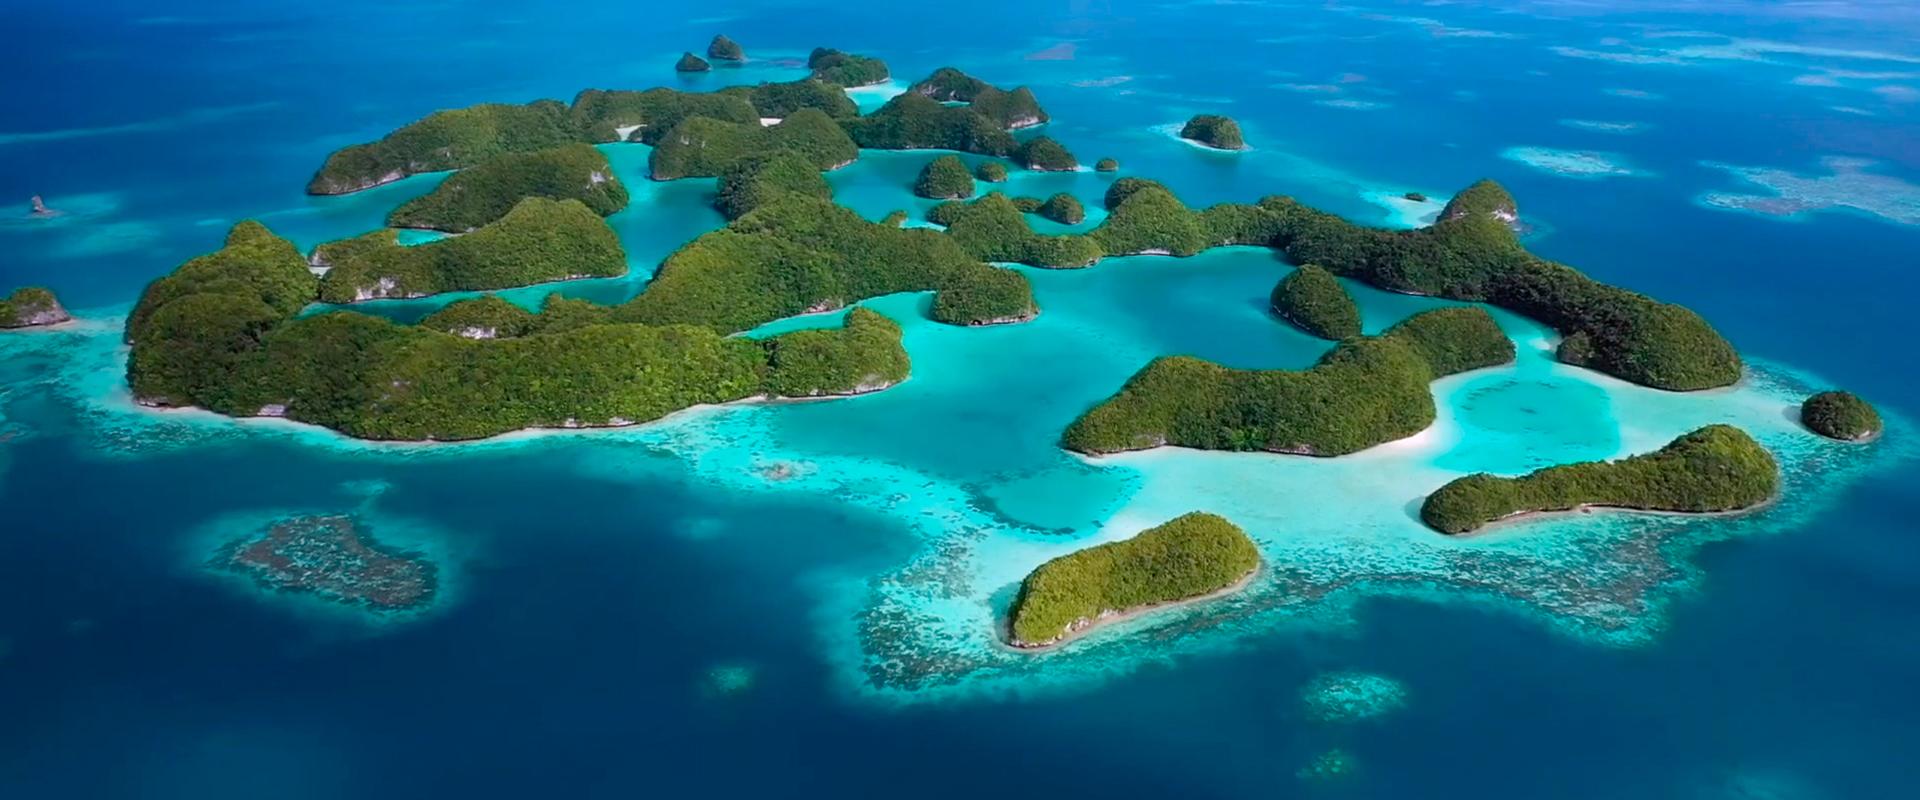 Palau Ocean